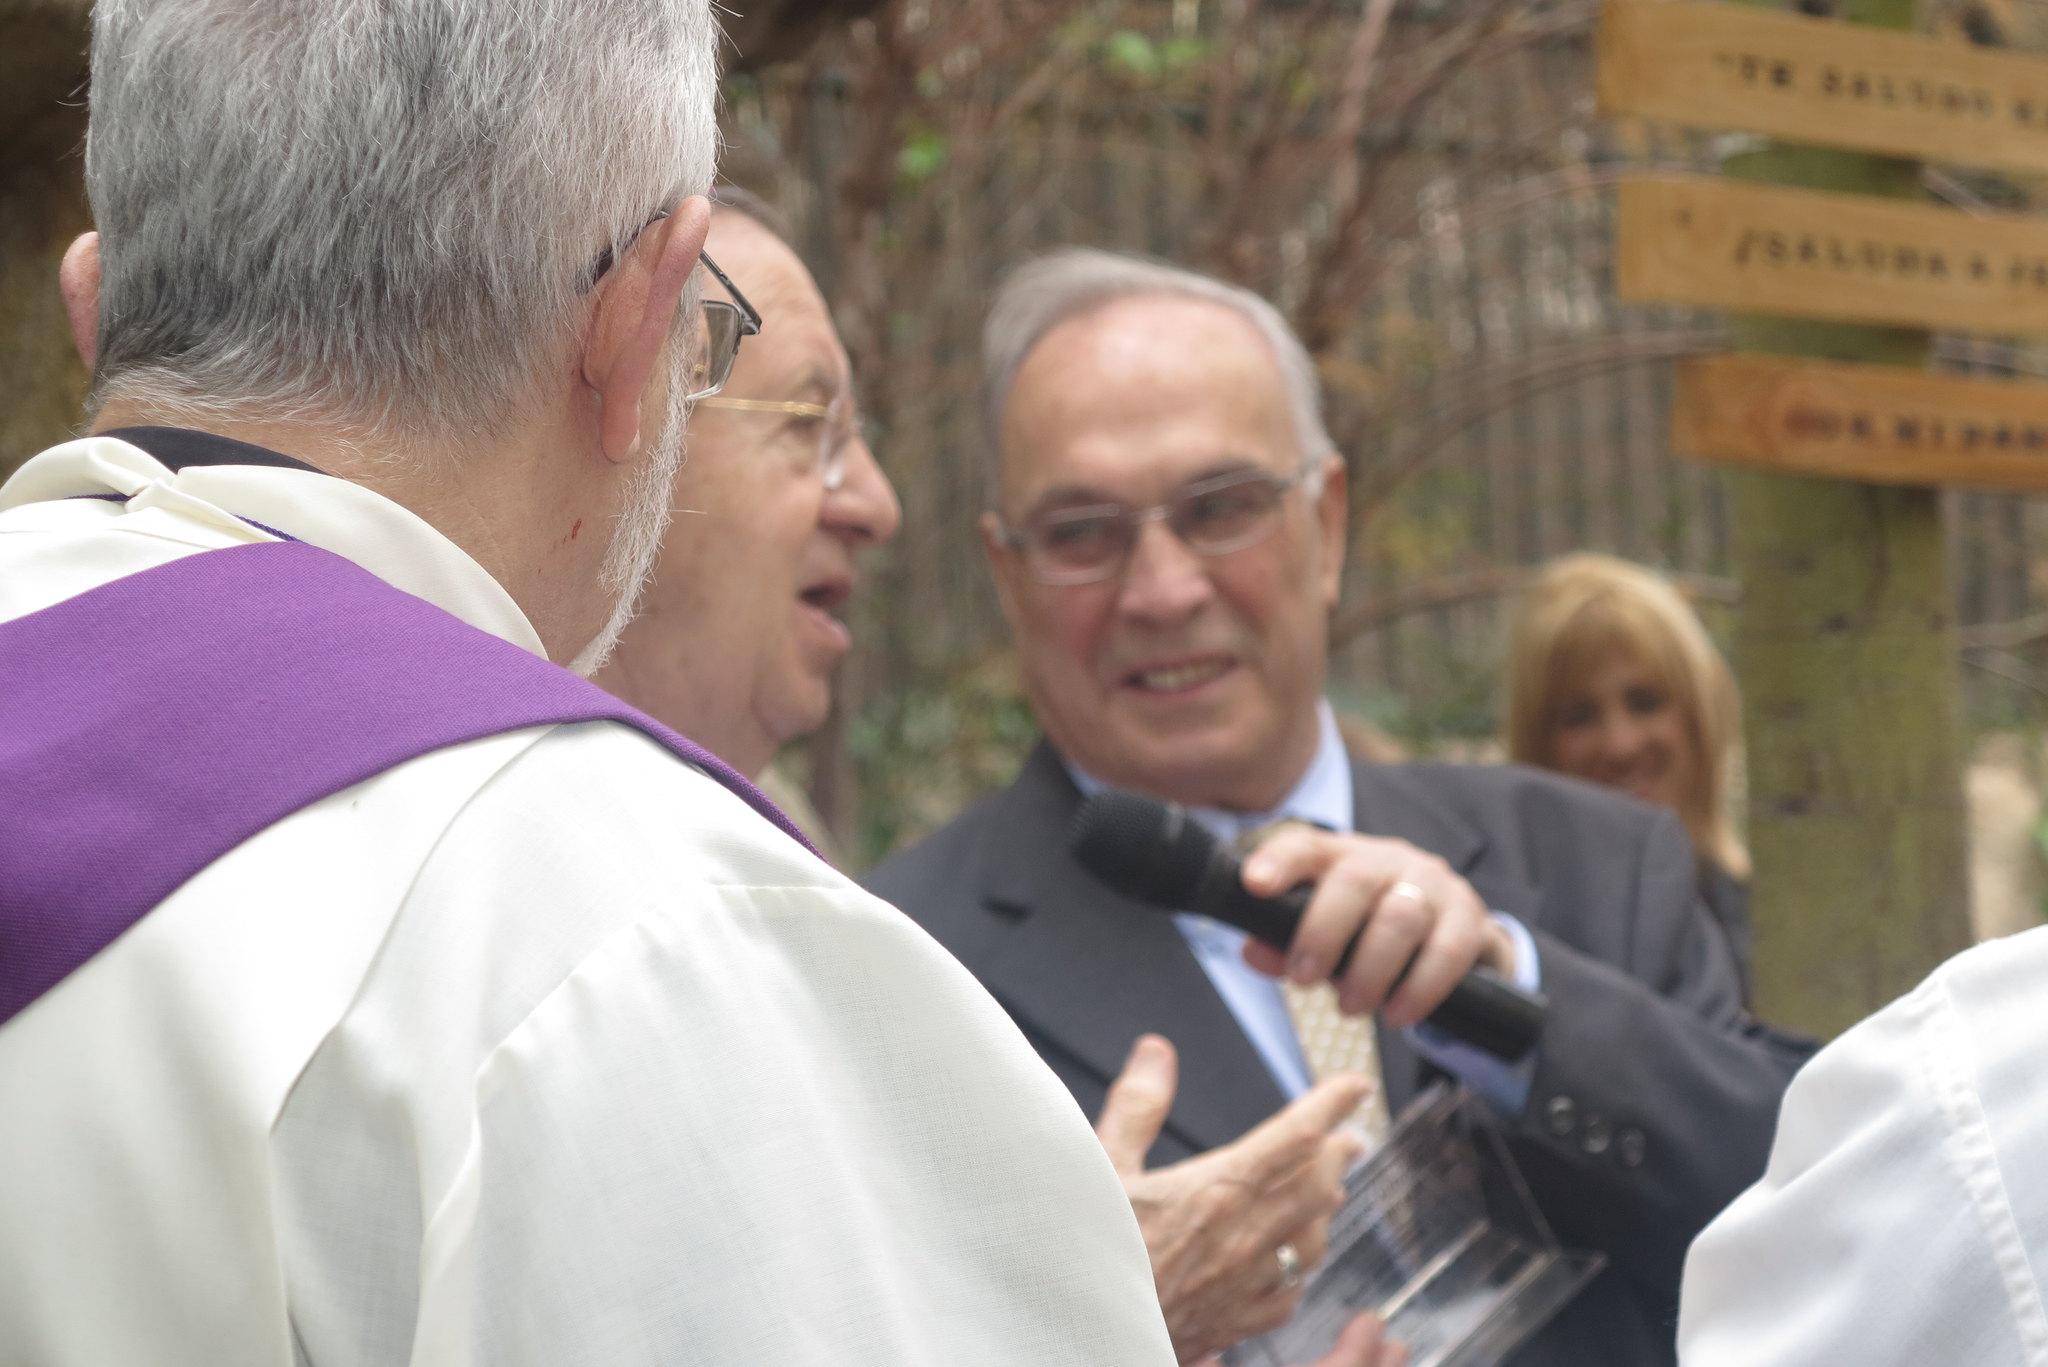 (2016-02-13) - Inauguración Virgen de Lourdes, La Molineta - Archivo La Molineta 2 (54)